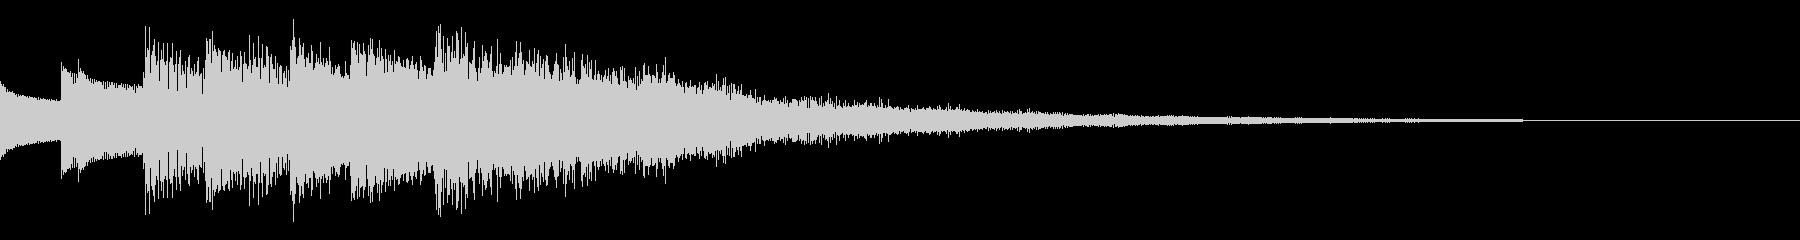 RPG風_回復魔法音1の未再生の波形